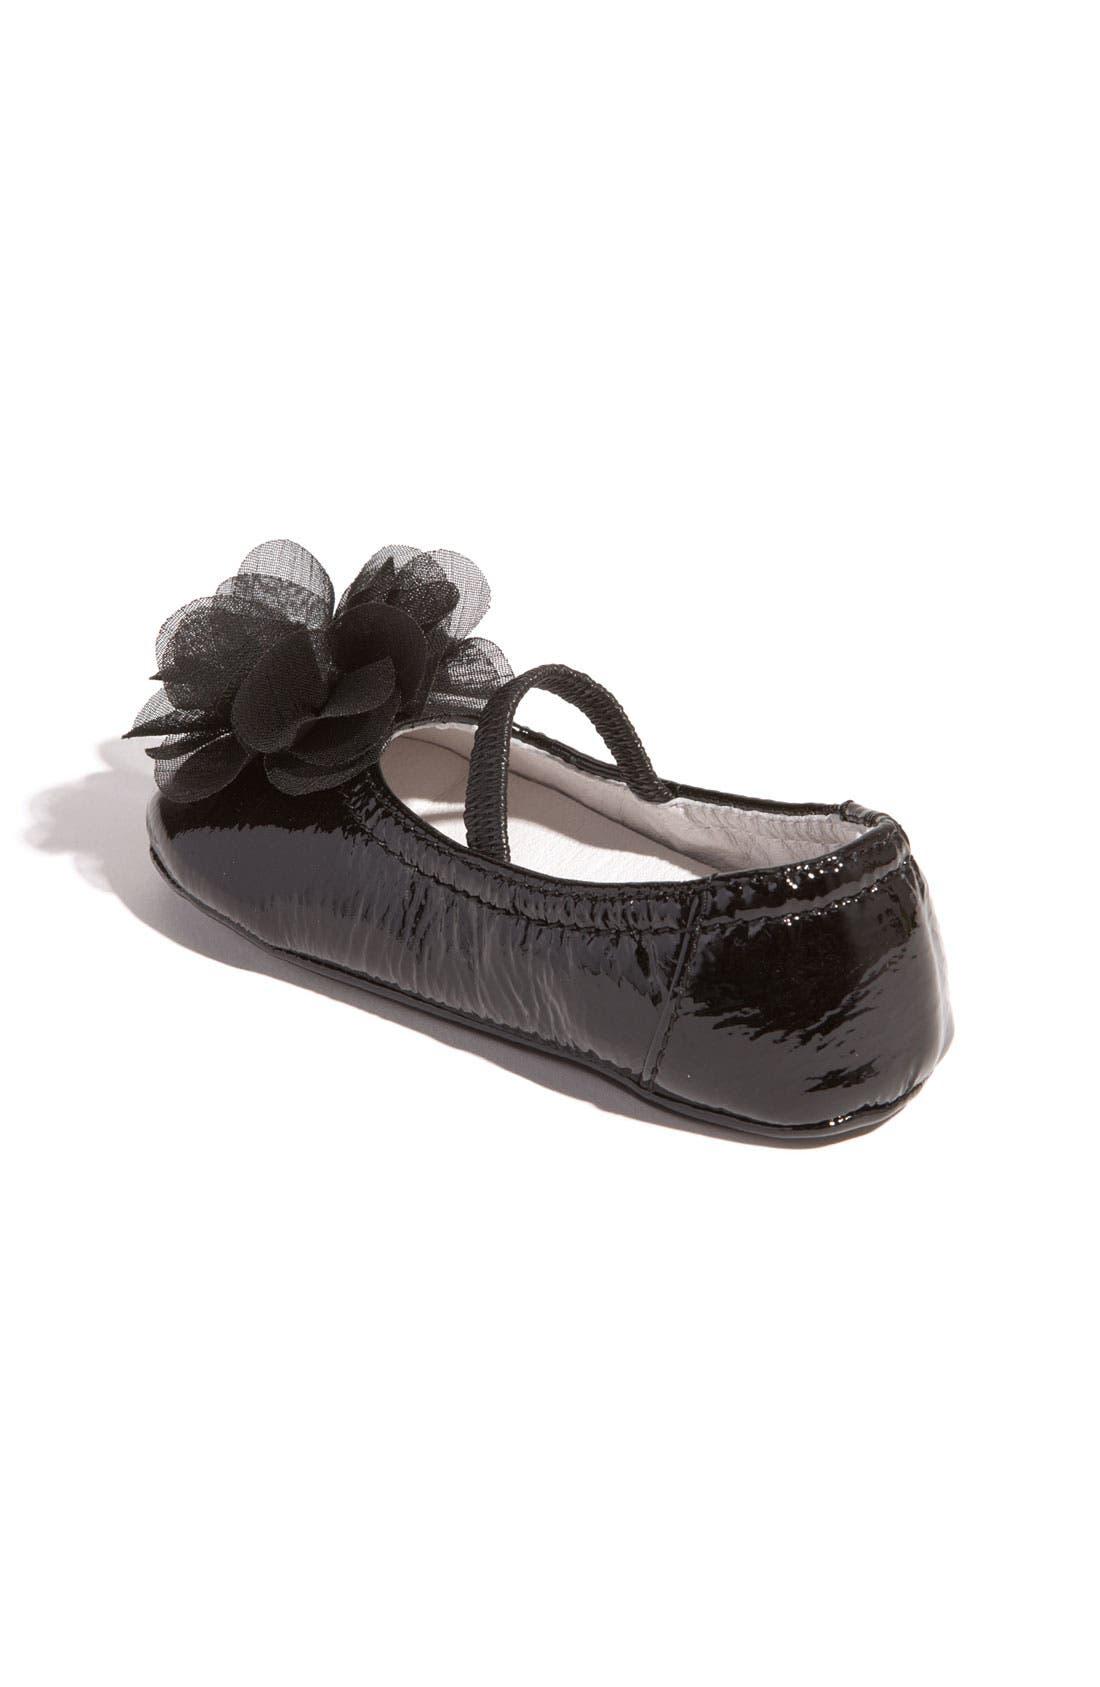 Alternate Image 2  - Nordstrom Baby 'Pretty' Dress Shoe (Infant)